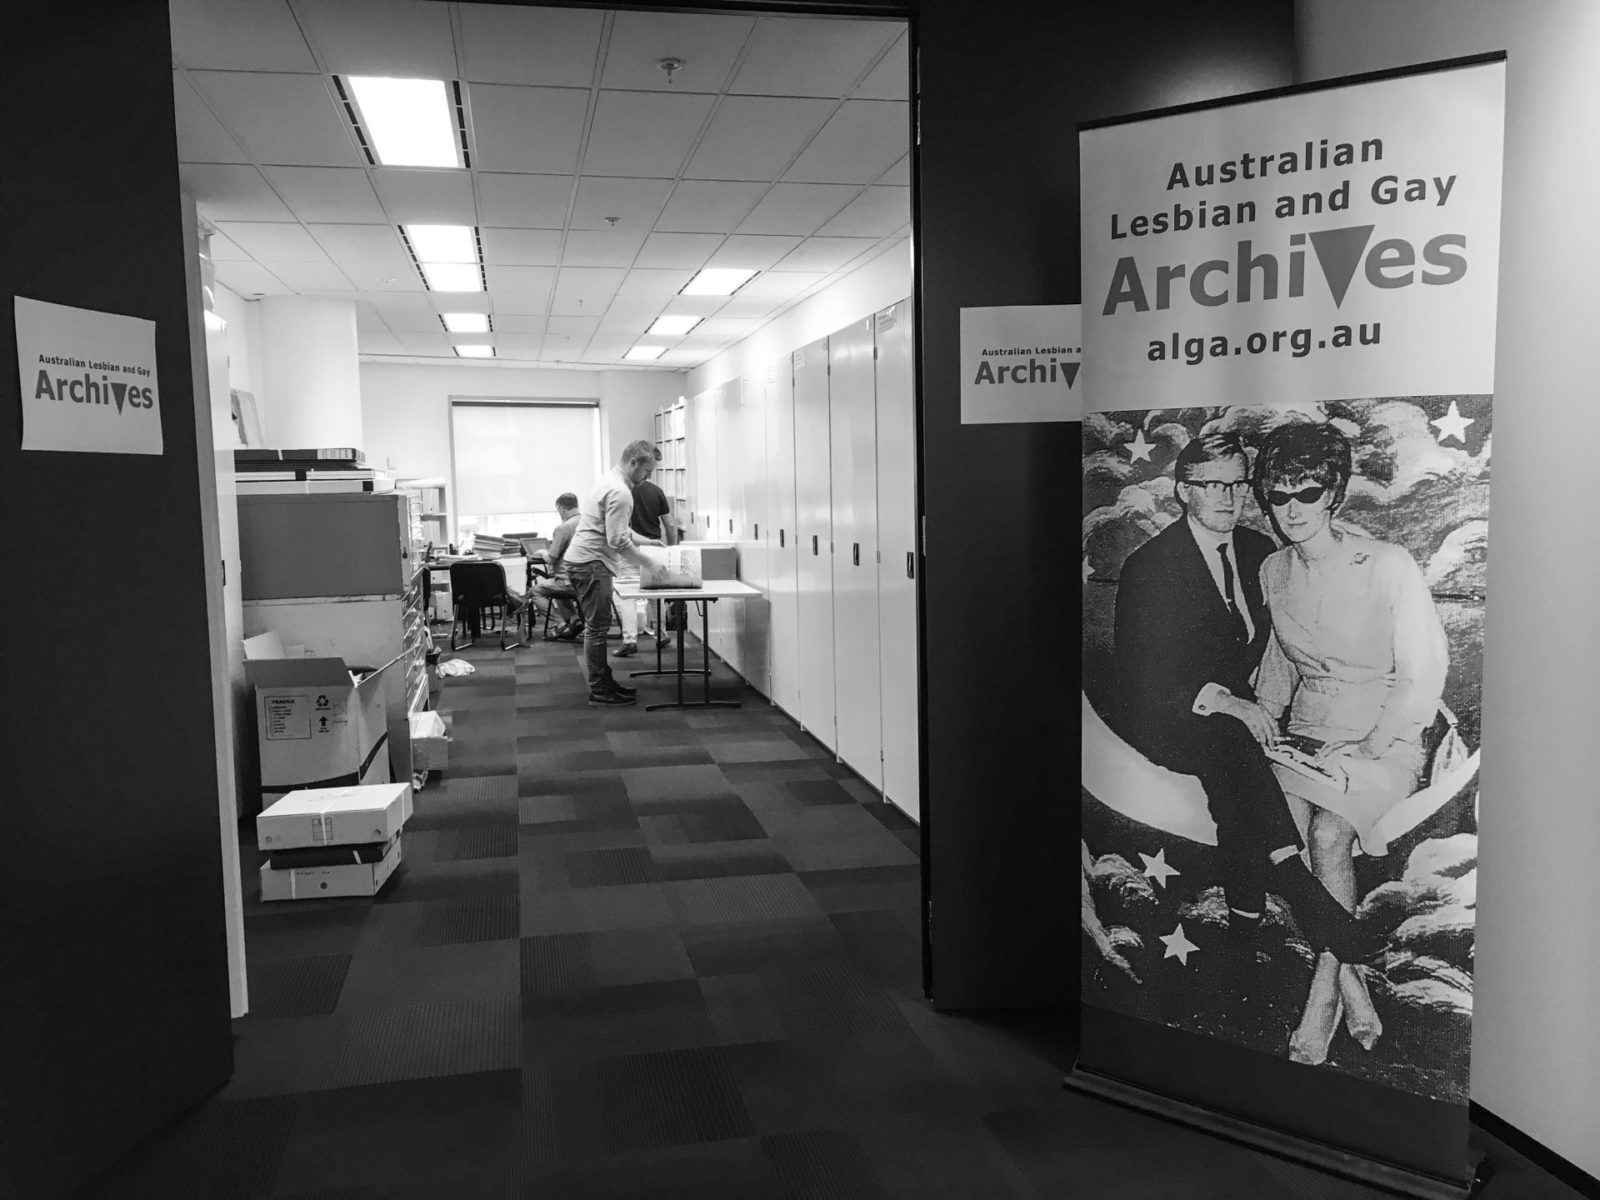 (L-R) Grahan Willett and Nick Henderson, ALGA Reading Room, 615 St Kilda Road Melbourne, 2017 (photo: Kathy Sport)